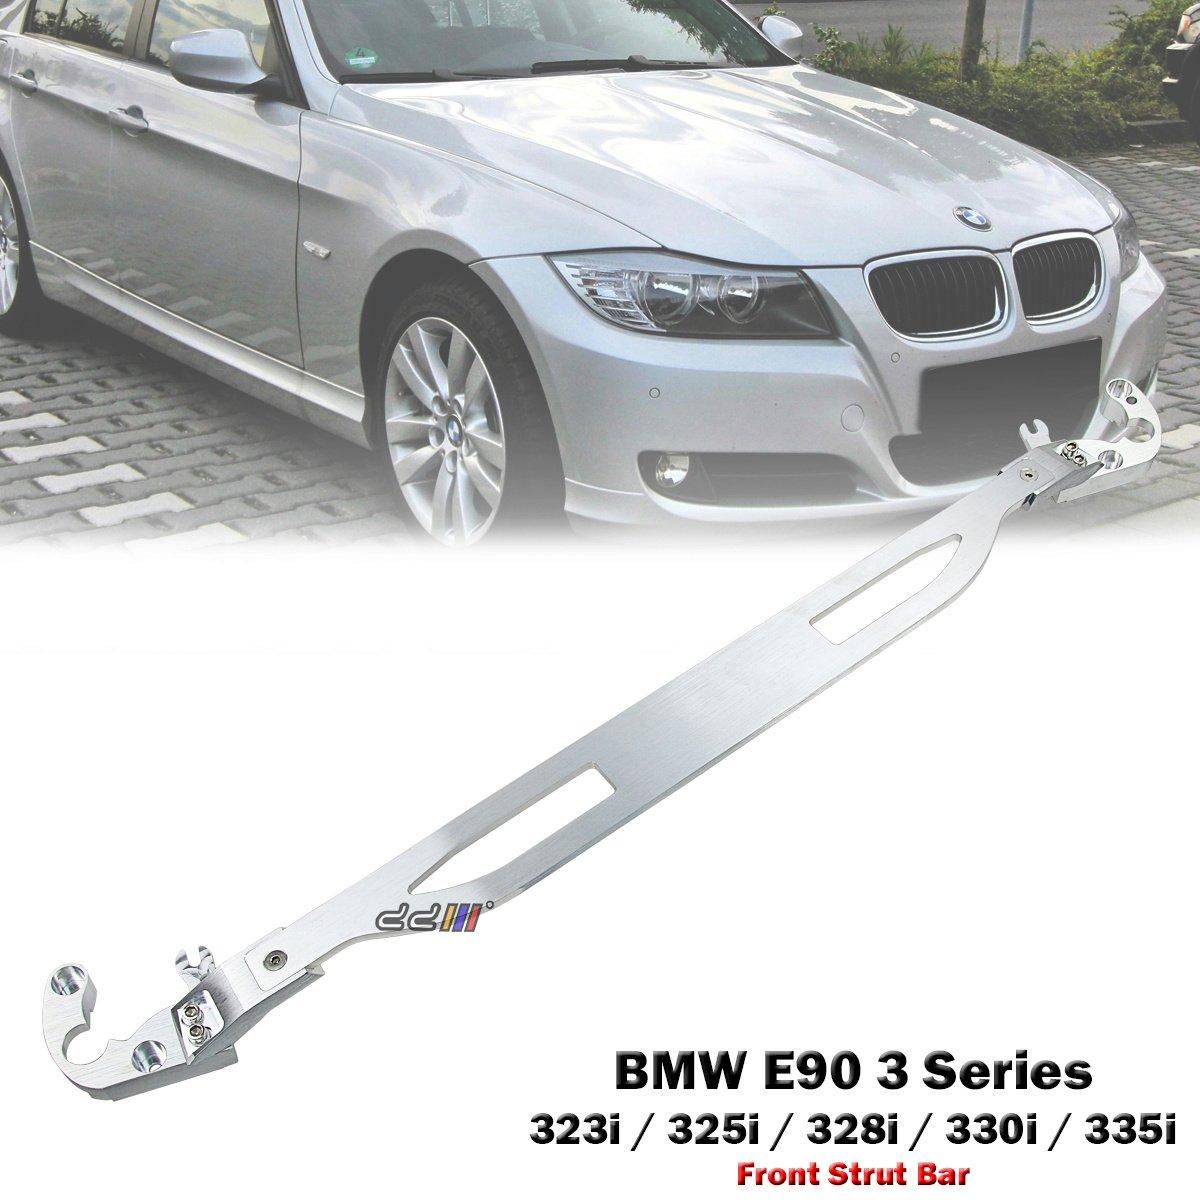 Amazon.com: Front Upper Strut Tower Brace Bar For BMW E90 E91 E92 3 Series  323i 325i 328i 330i 335i 2005-13: Automotive